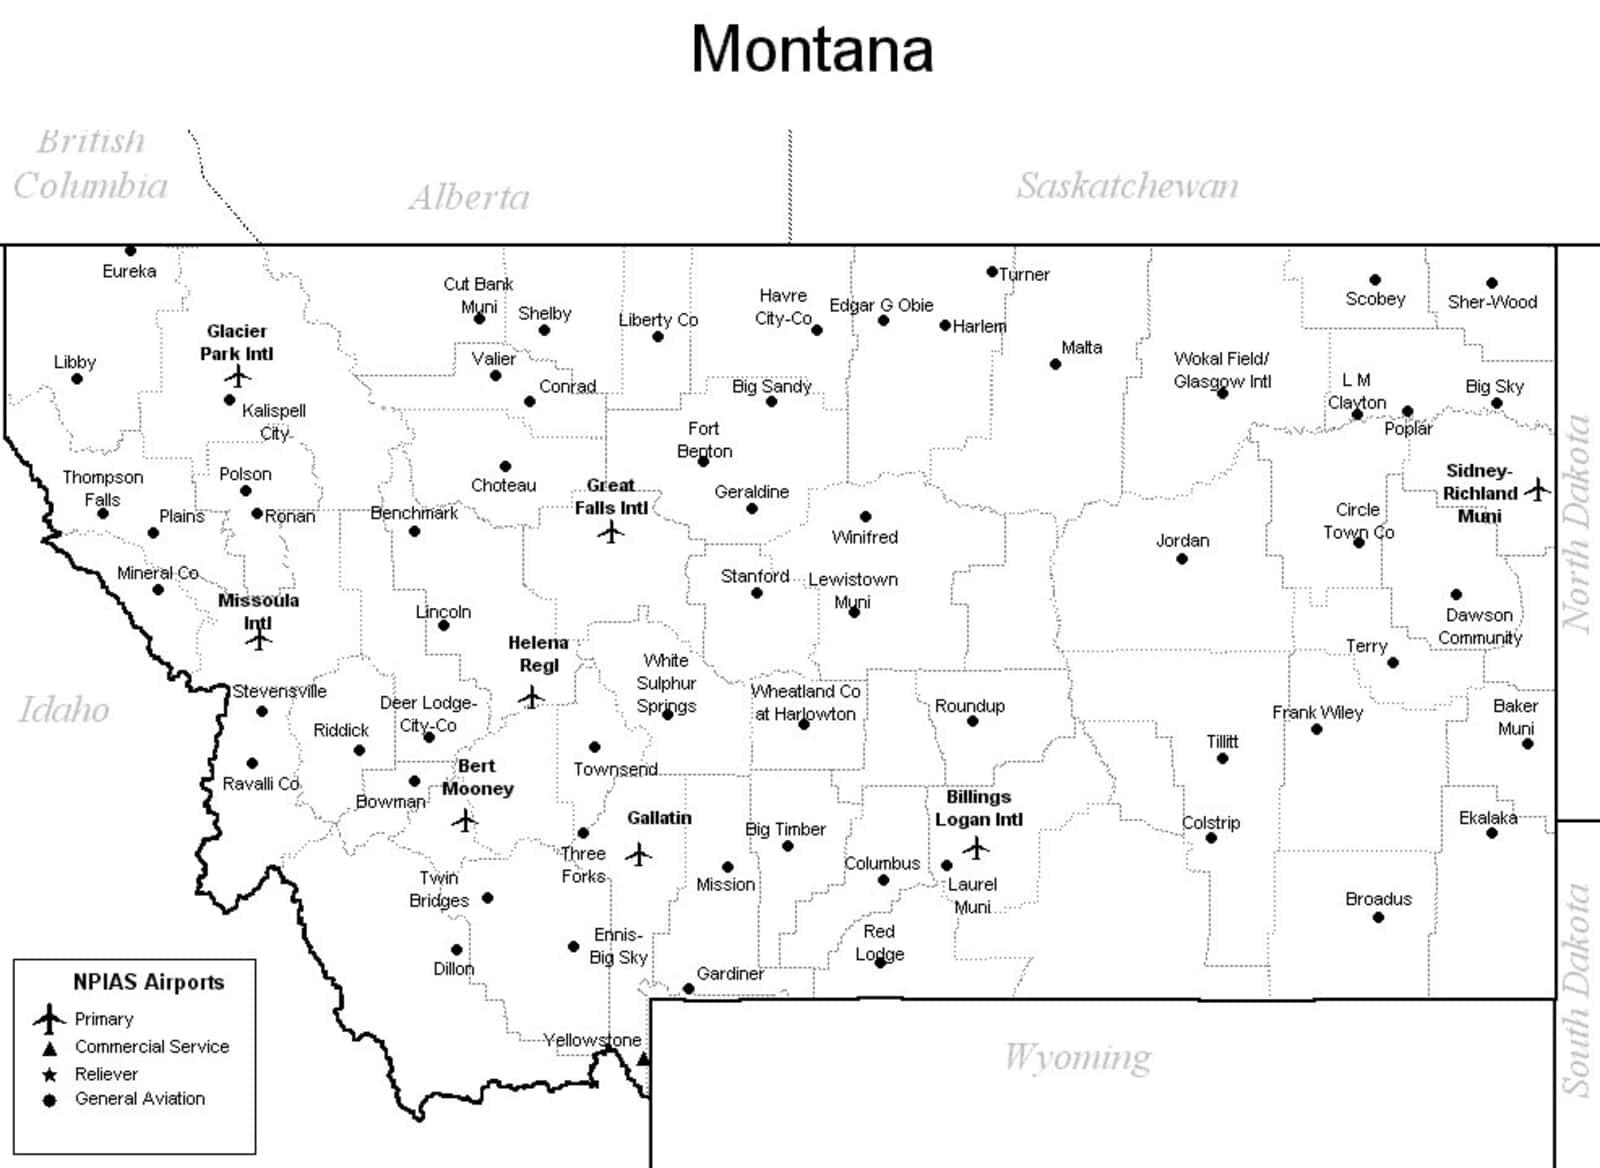 Montana Airport Map - Montana Airports